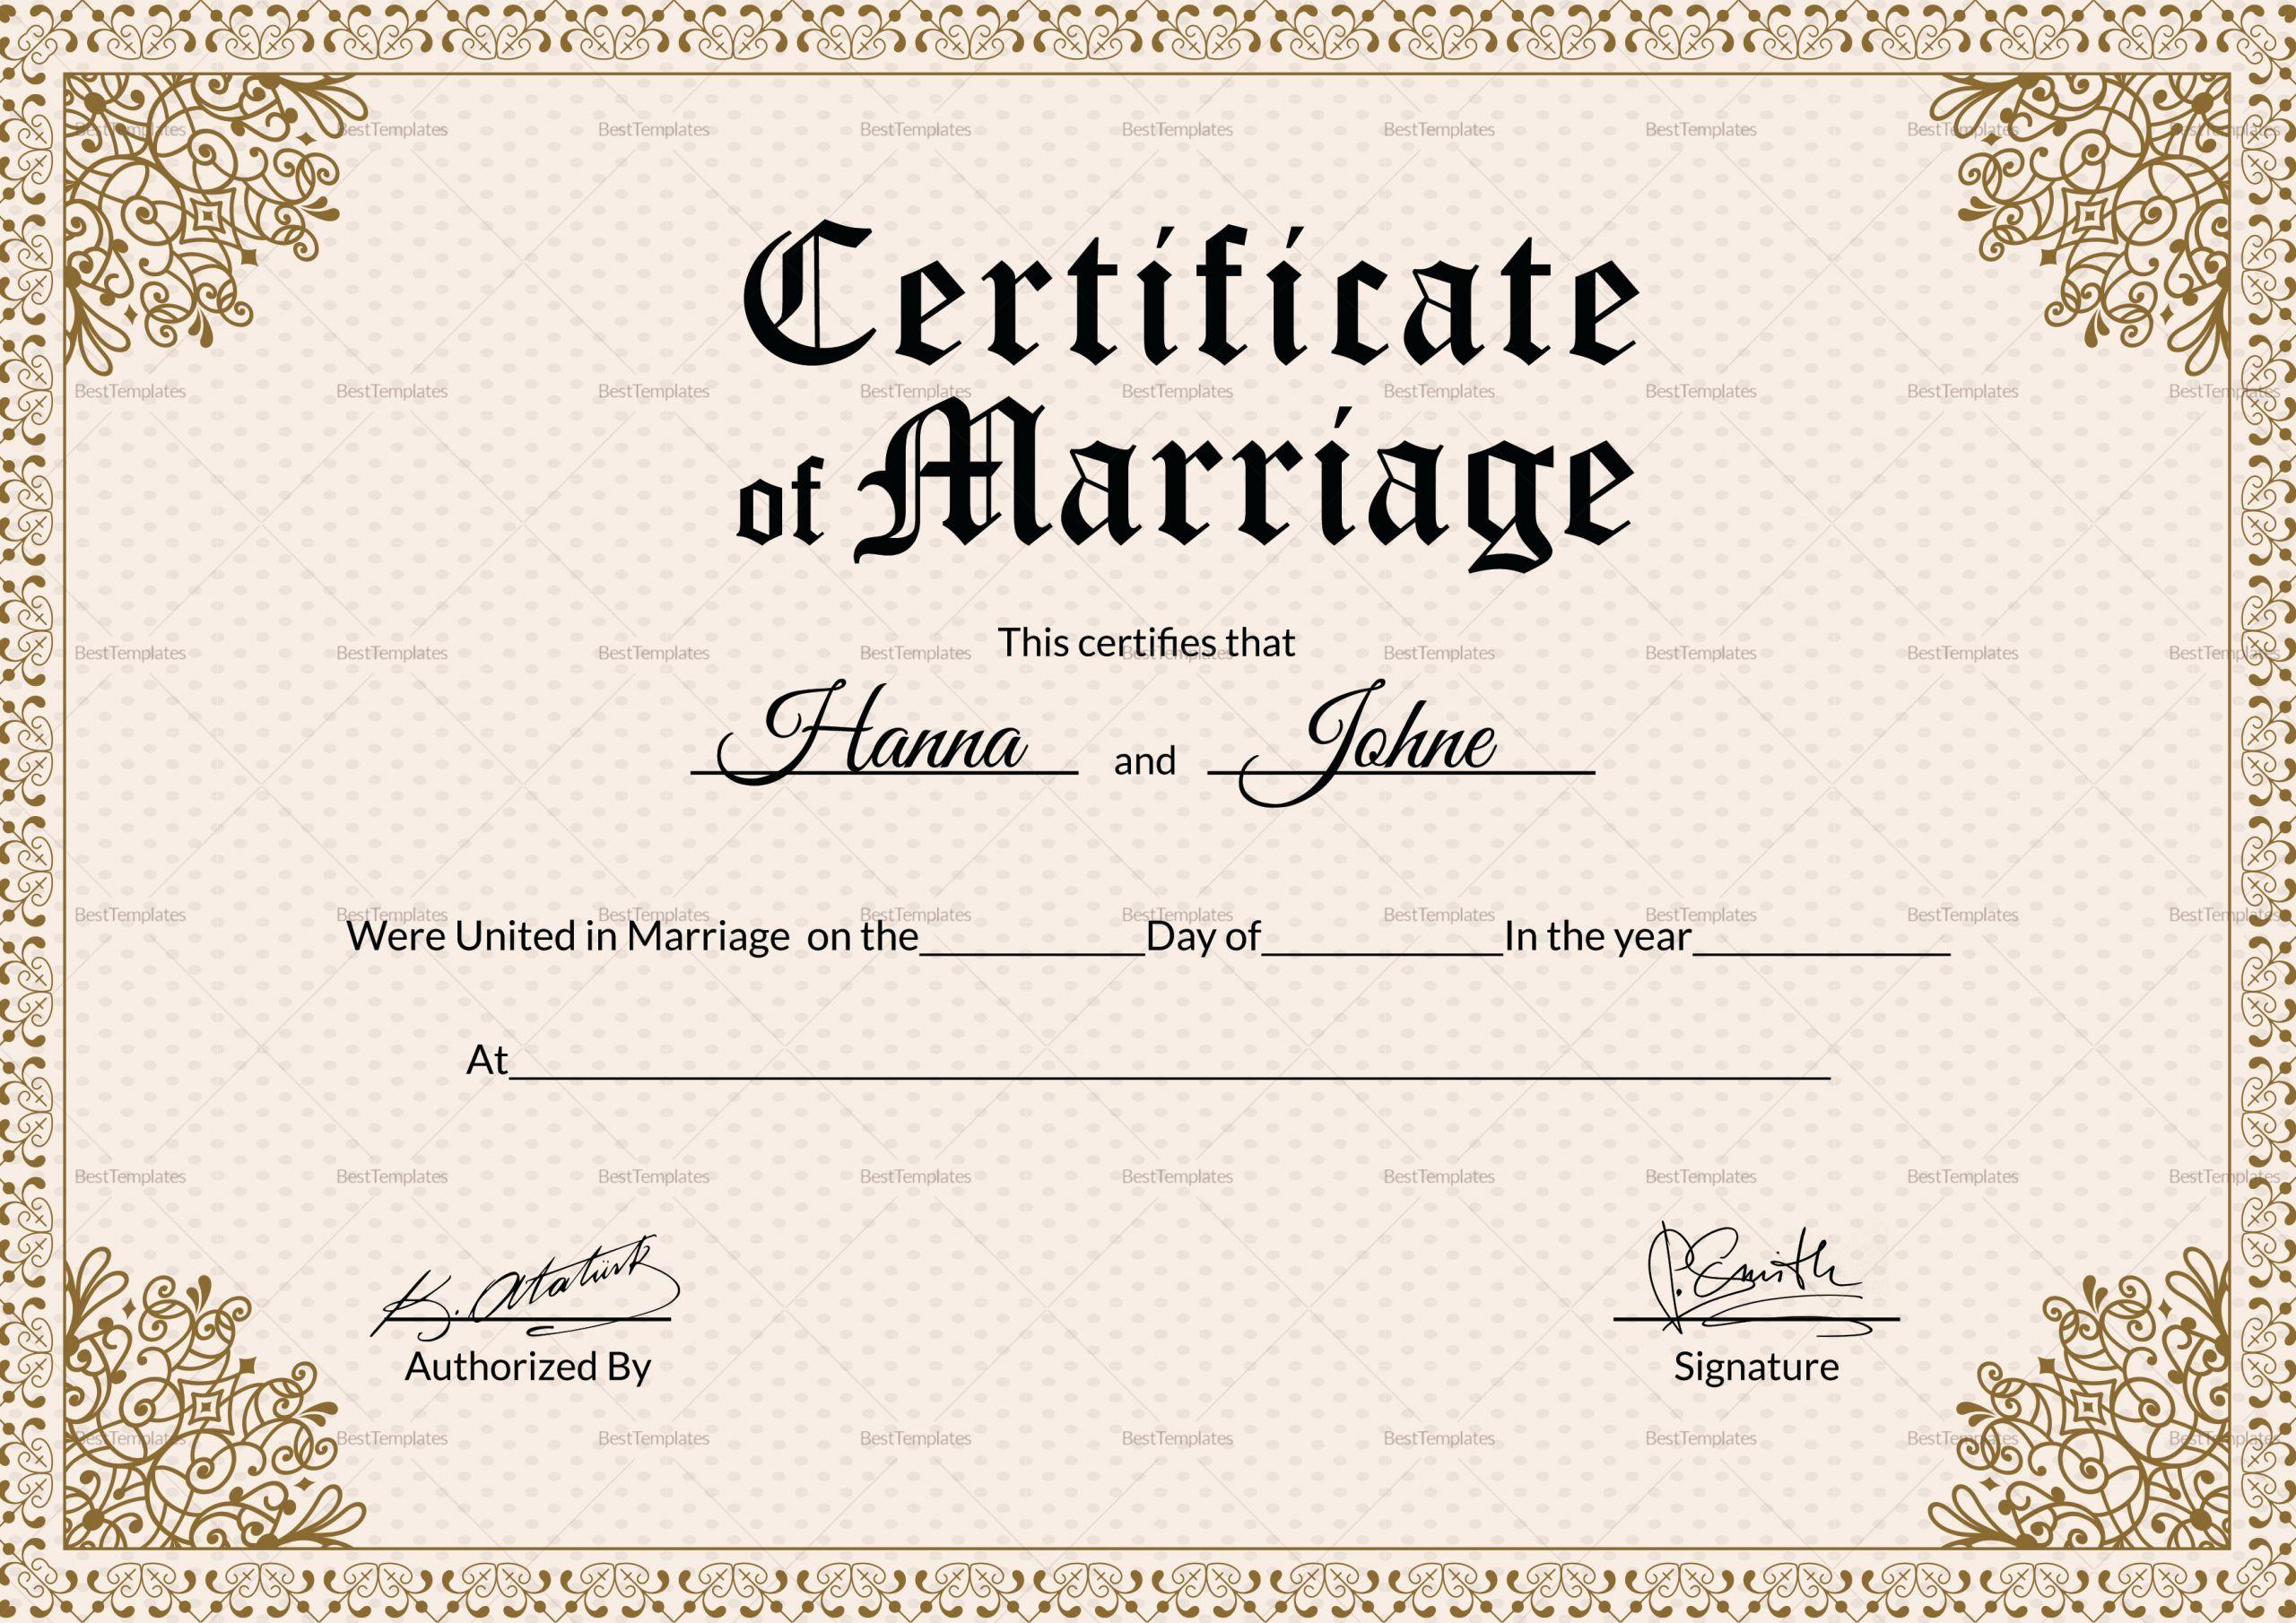 Microsoft Office Marriage Certificate Template Elegant Keepsake Marriage Certifi Marriage Certificate Template Marriage Certificate Marriage Certificate Design